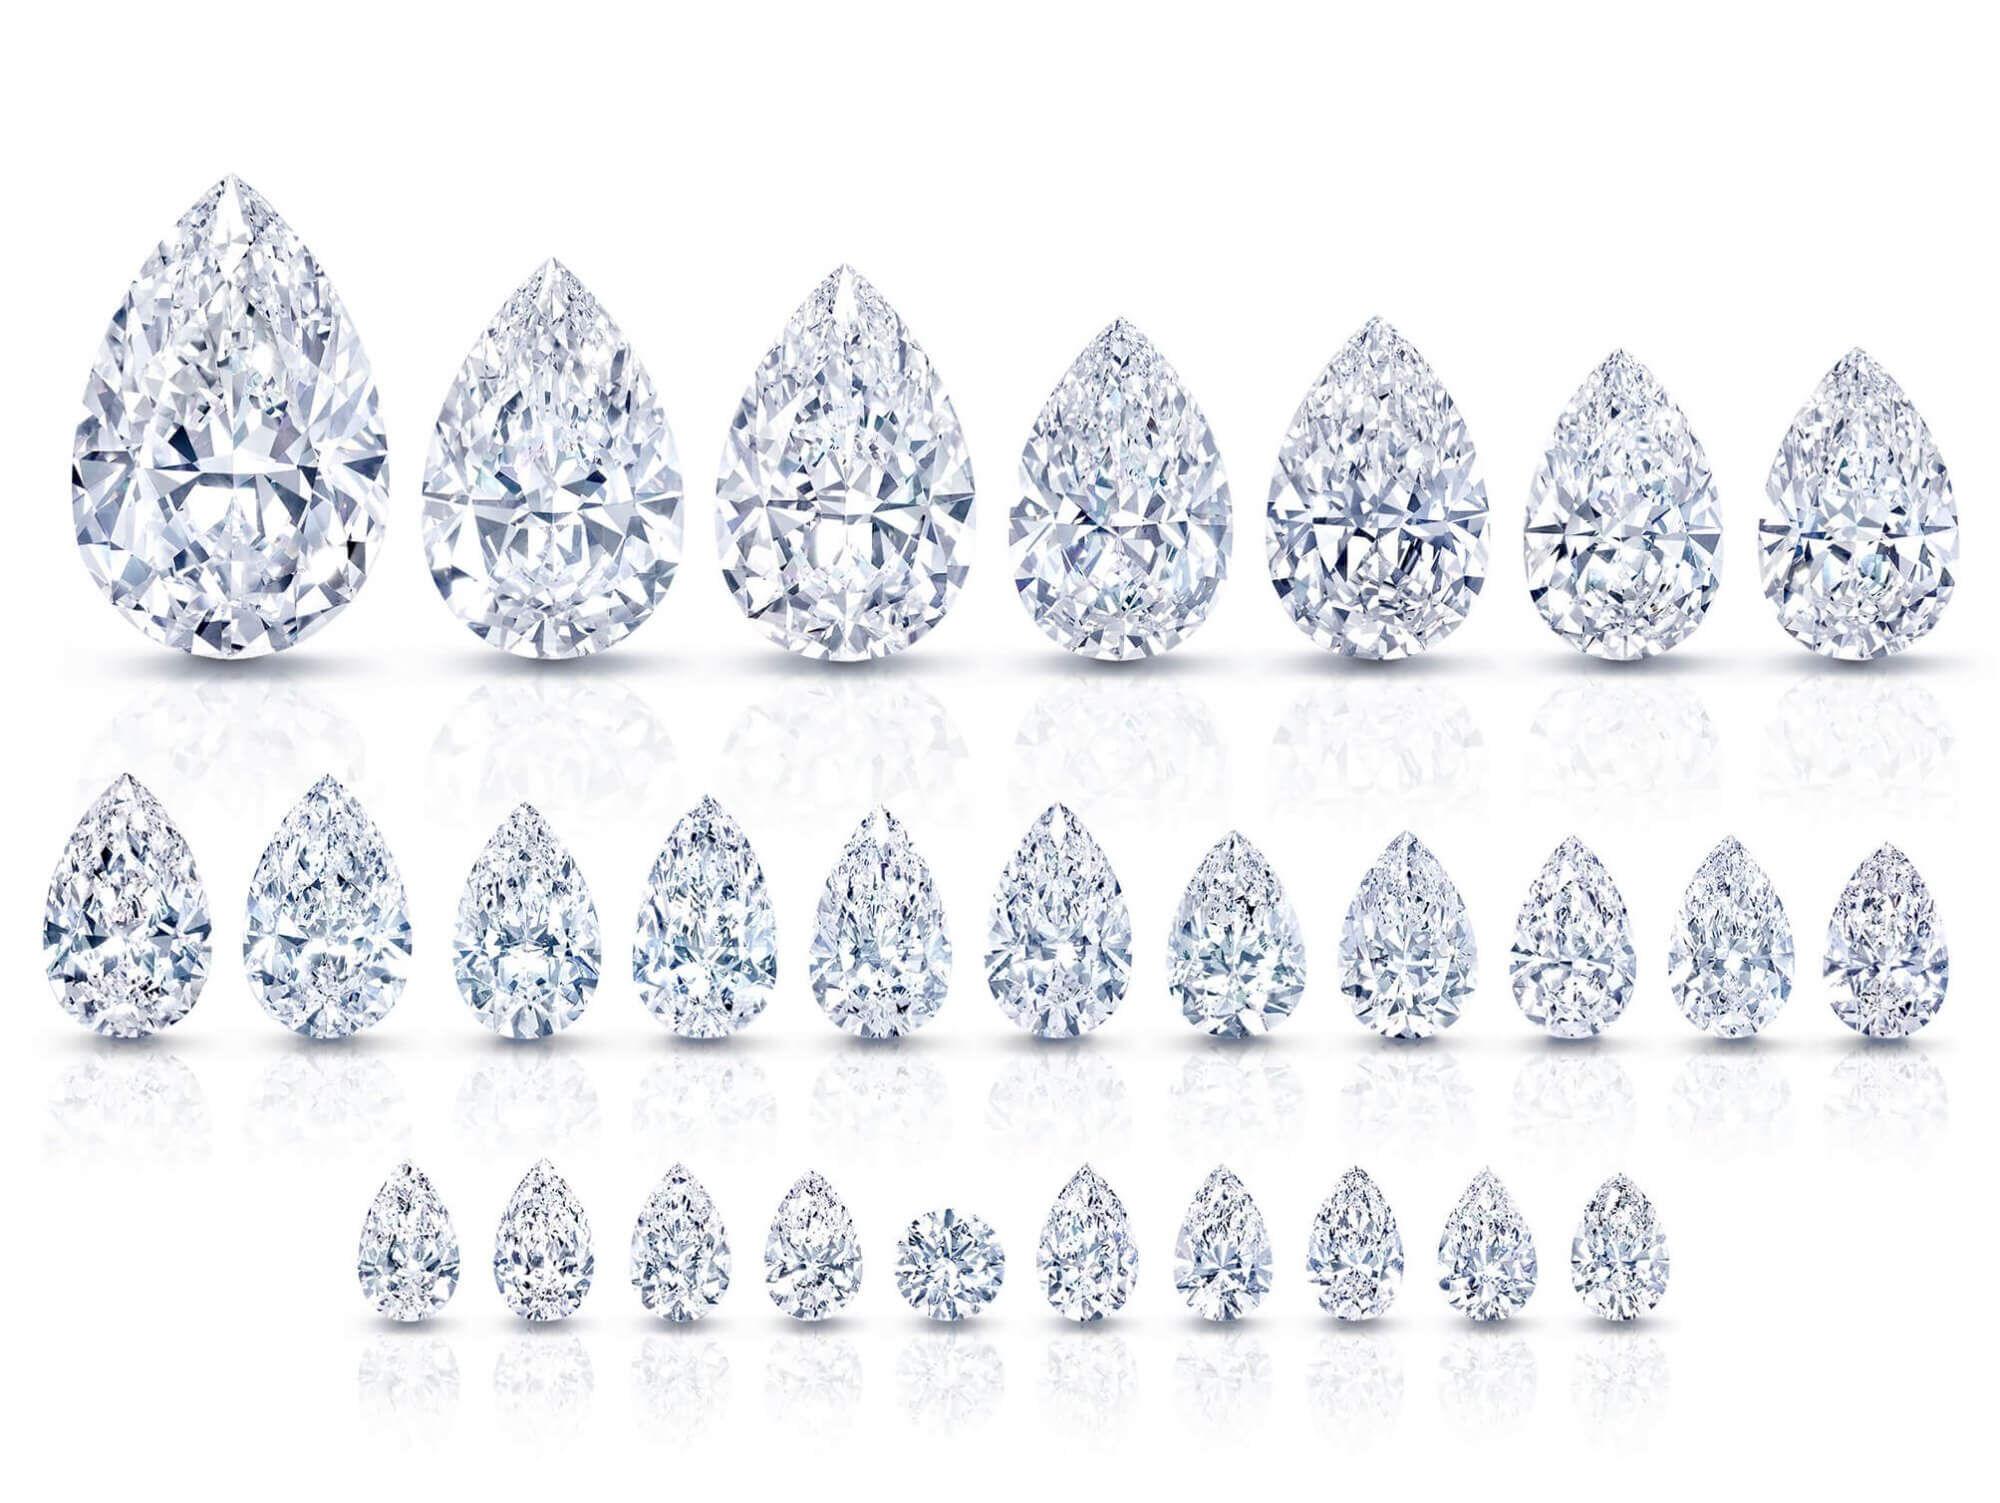 The Graff Letseng Star famous diamond and it's satellite diamonds